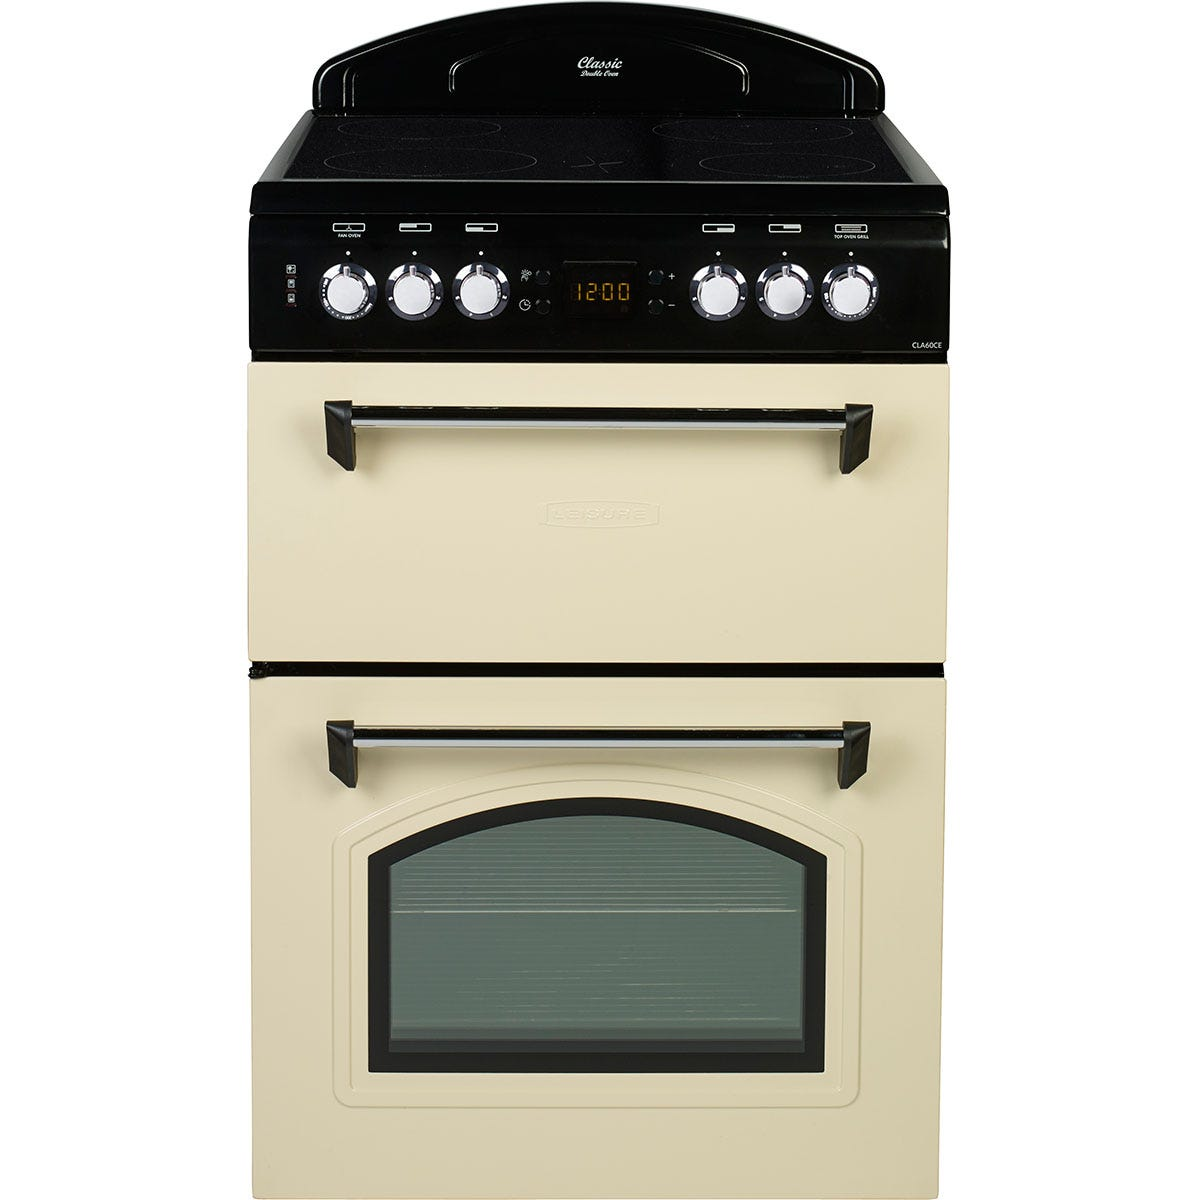 Leisure CLA60CEC Classic Range-Style 60cm Electric Cooker - Cream